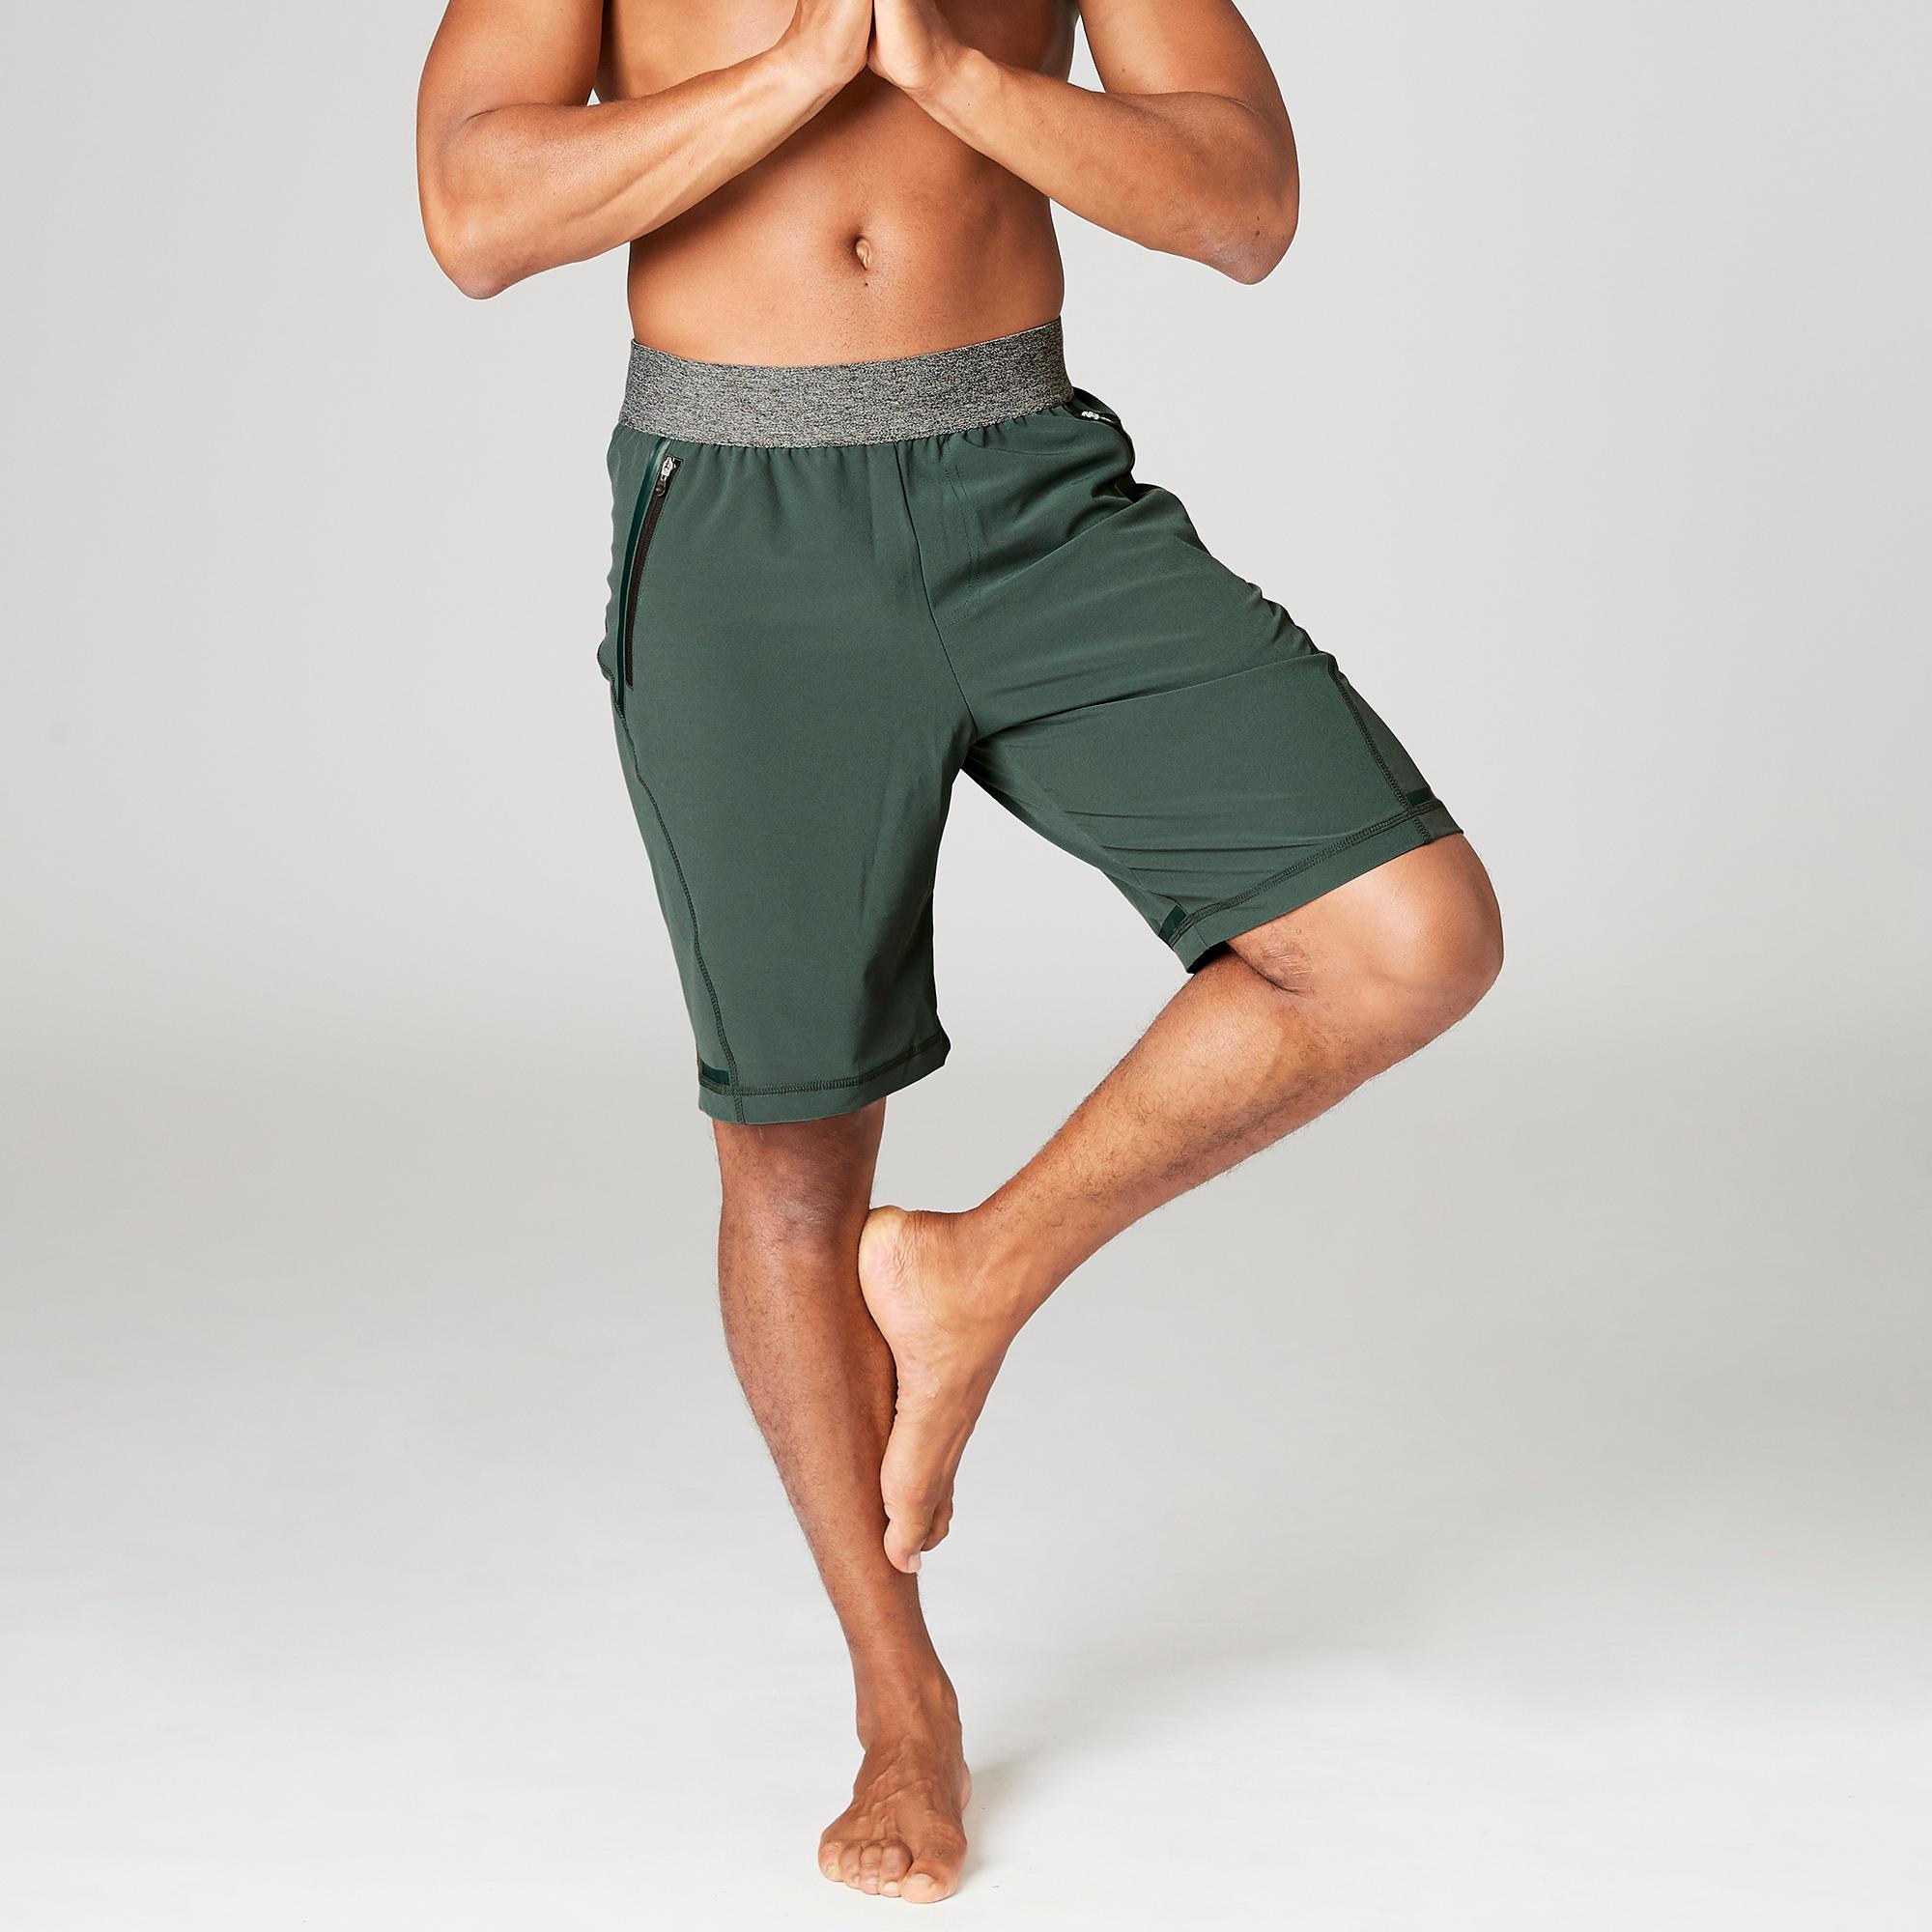 b6047f09b Comprar Ropa de Yoga para Hombre | Decathlon